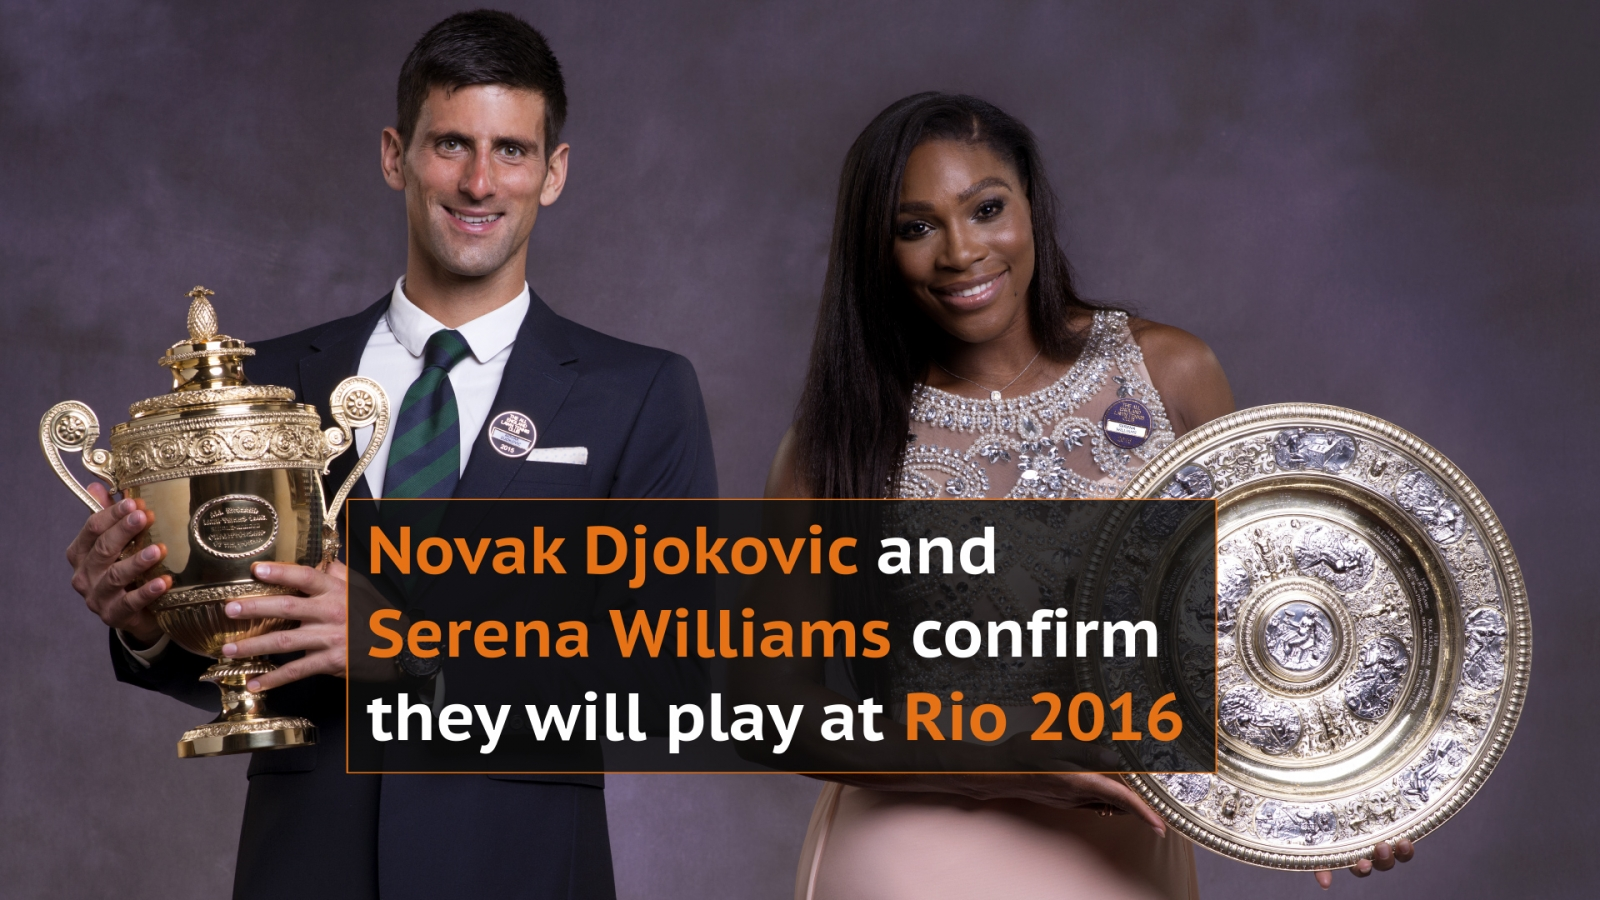 Rio Olympics: Novak Djokovic and Serena Williams confirm they will play despite Zika virus fears